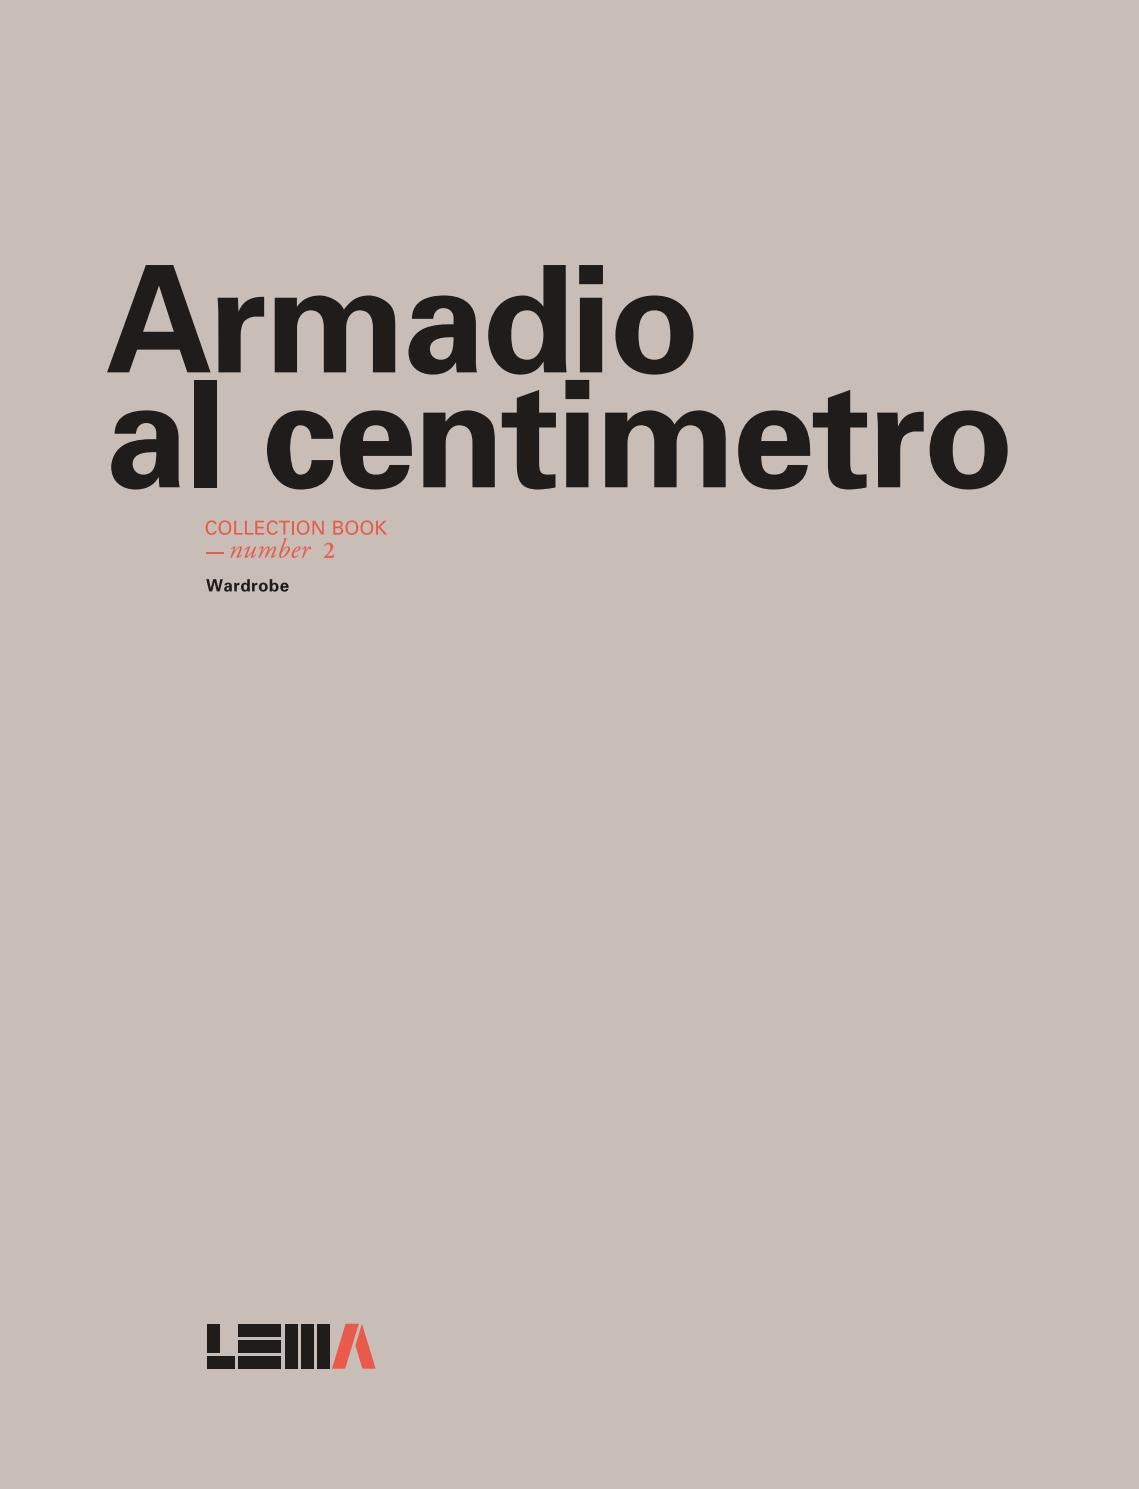 XTRA 2016 lema armadio al centimetro collection book by XTRA ...